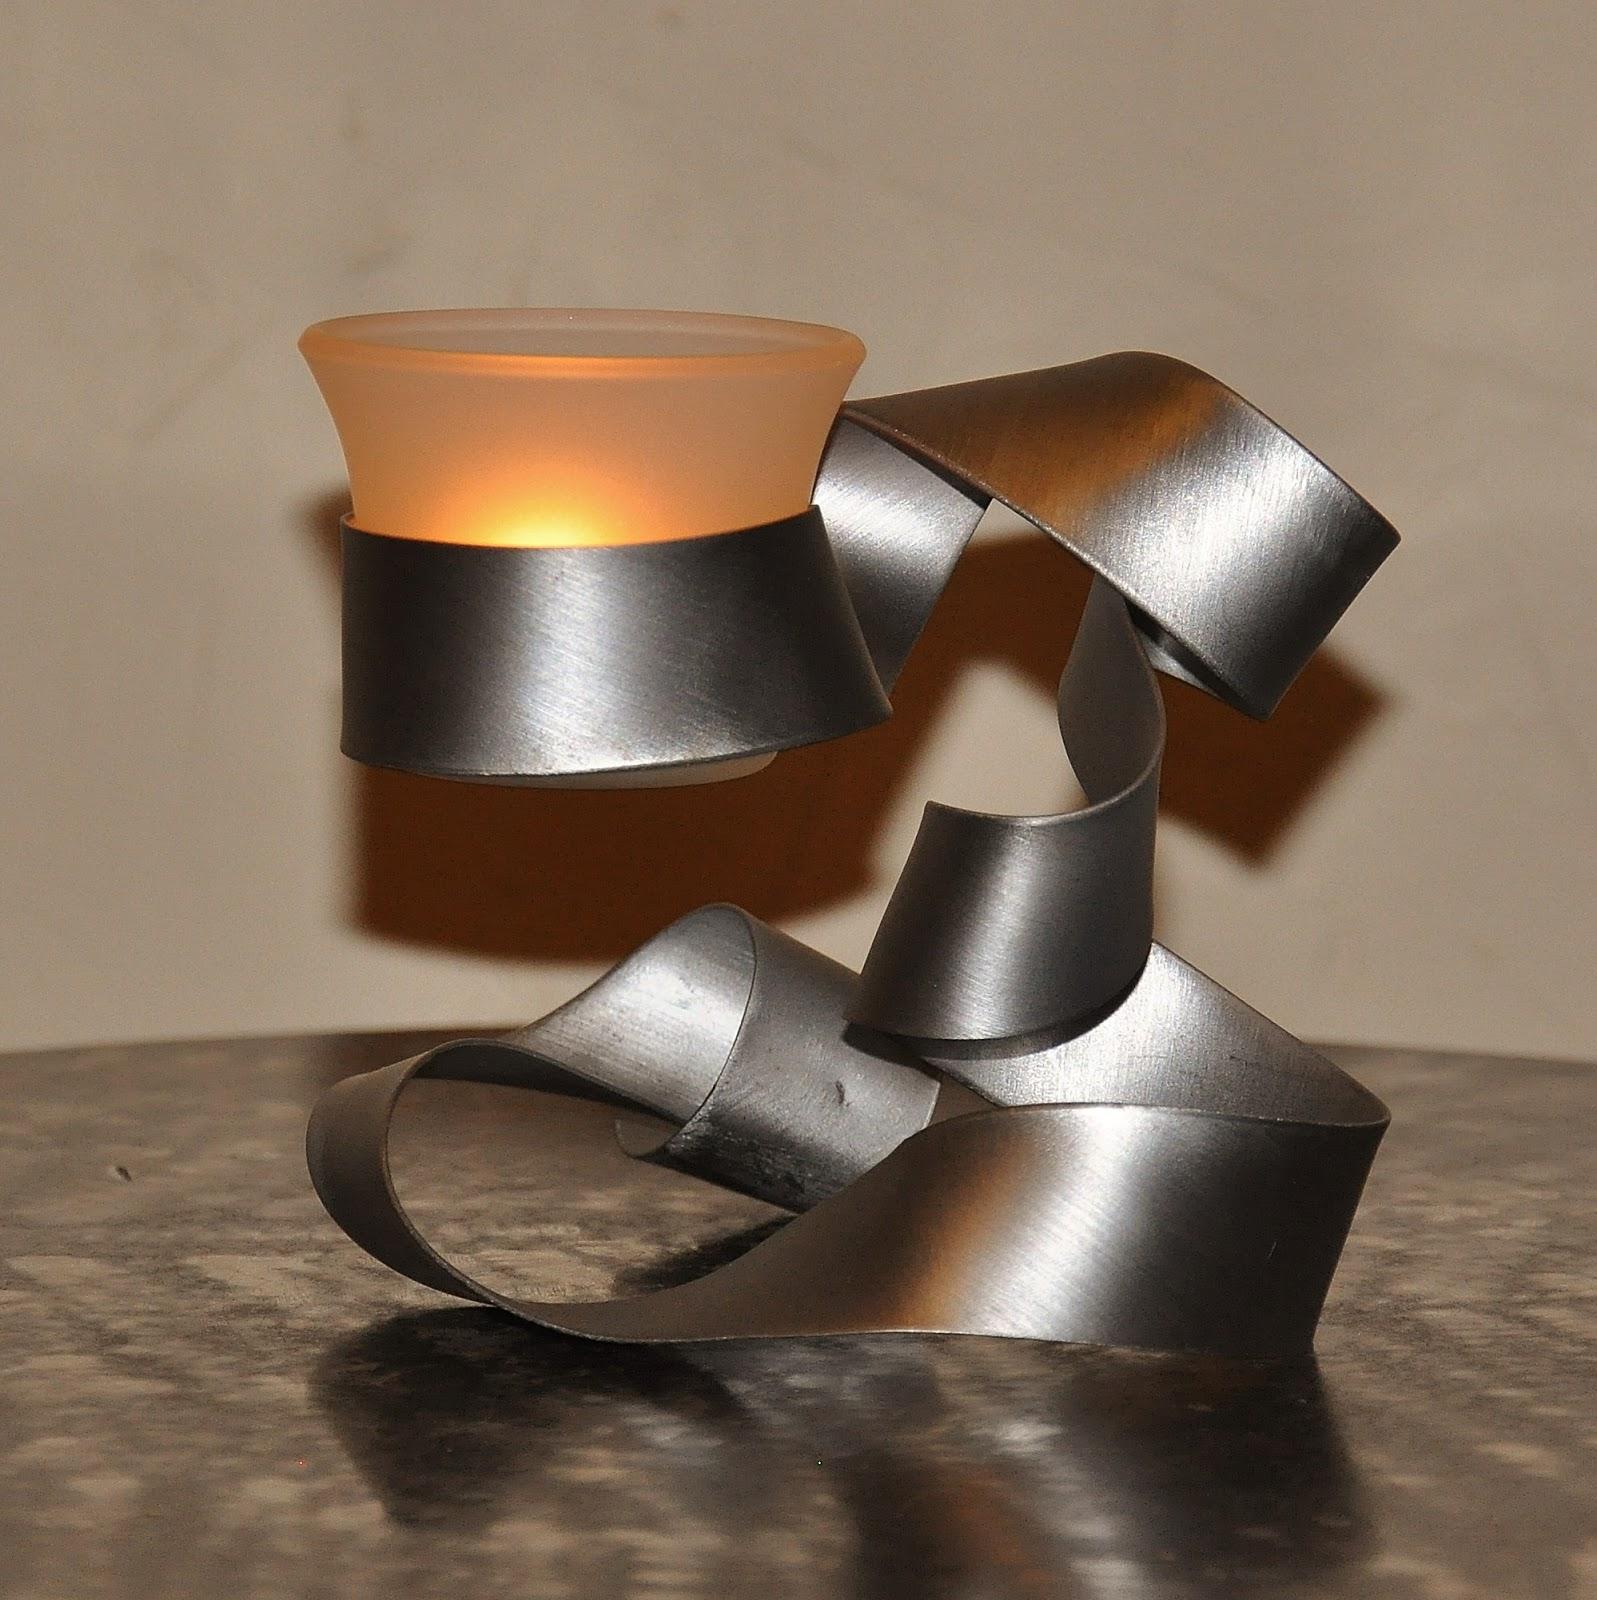 cr ateur d 39 objets d co en fer forg bougeoirs luminaires